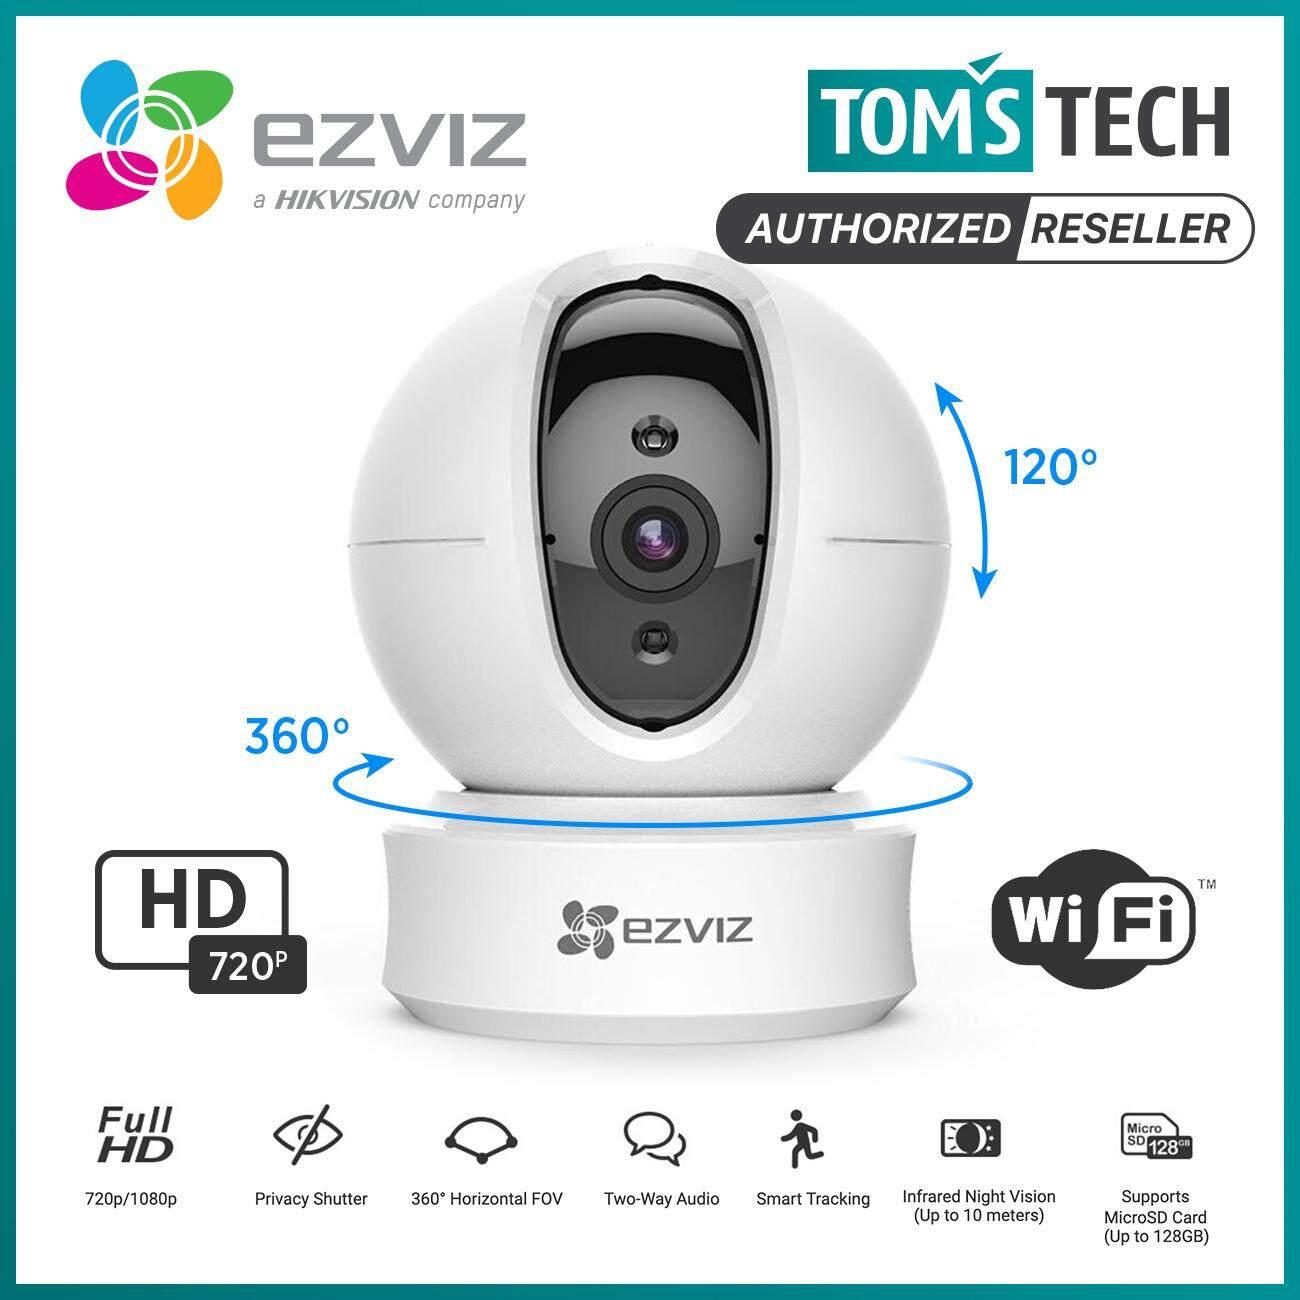 Ezviz C6C / C6CN EZ360 720P 360° Pan Tilt WiFi Wireless Network IP Security  CCTV Camera CS-CV246 - Tomstech